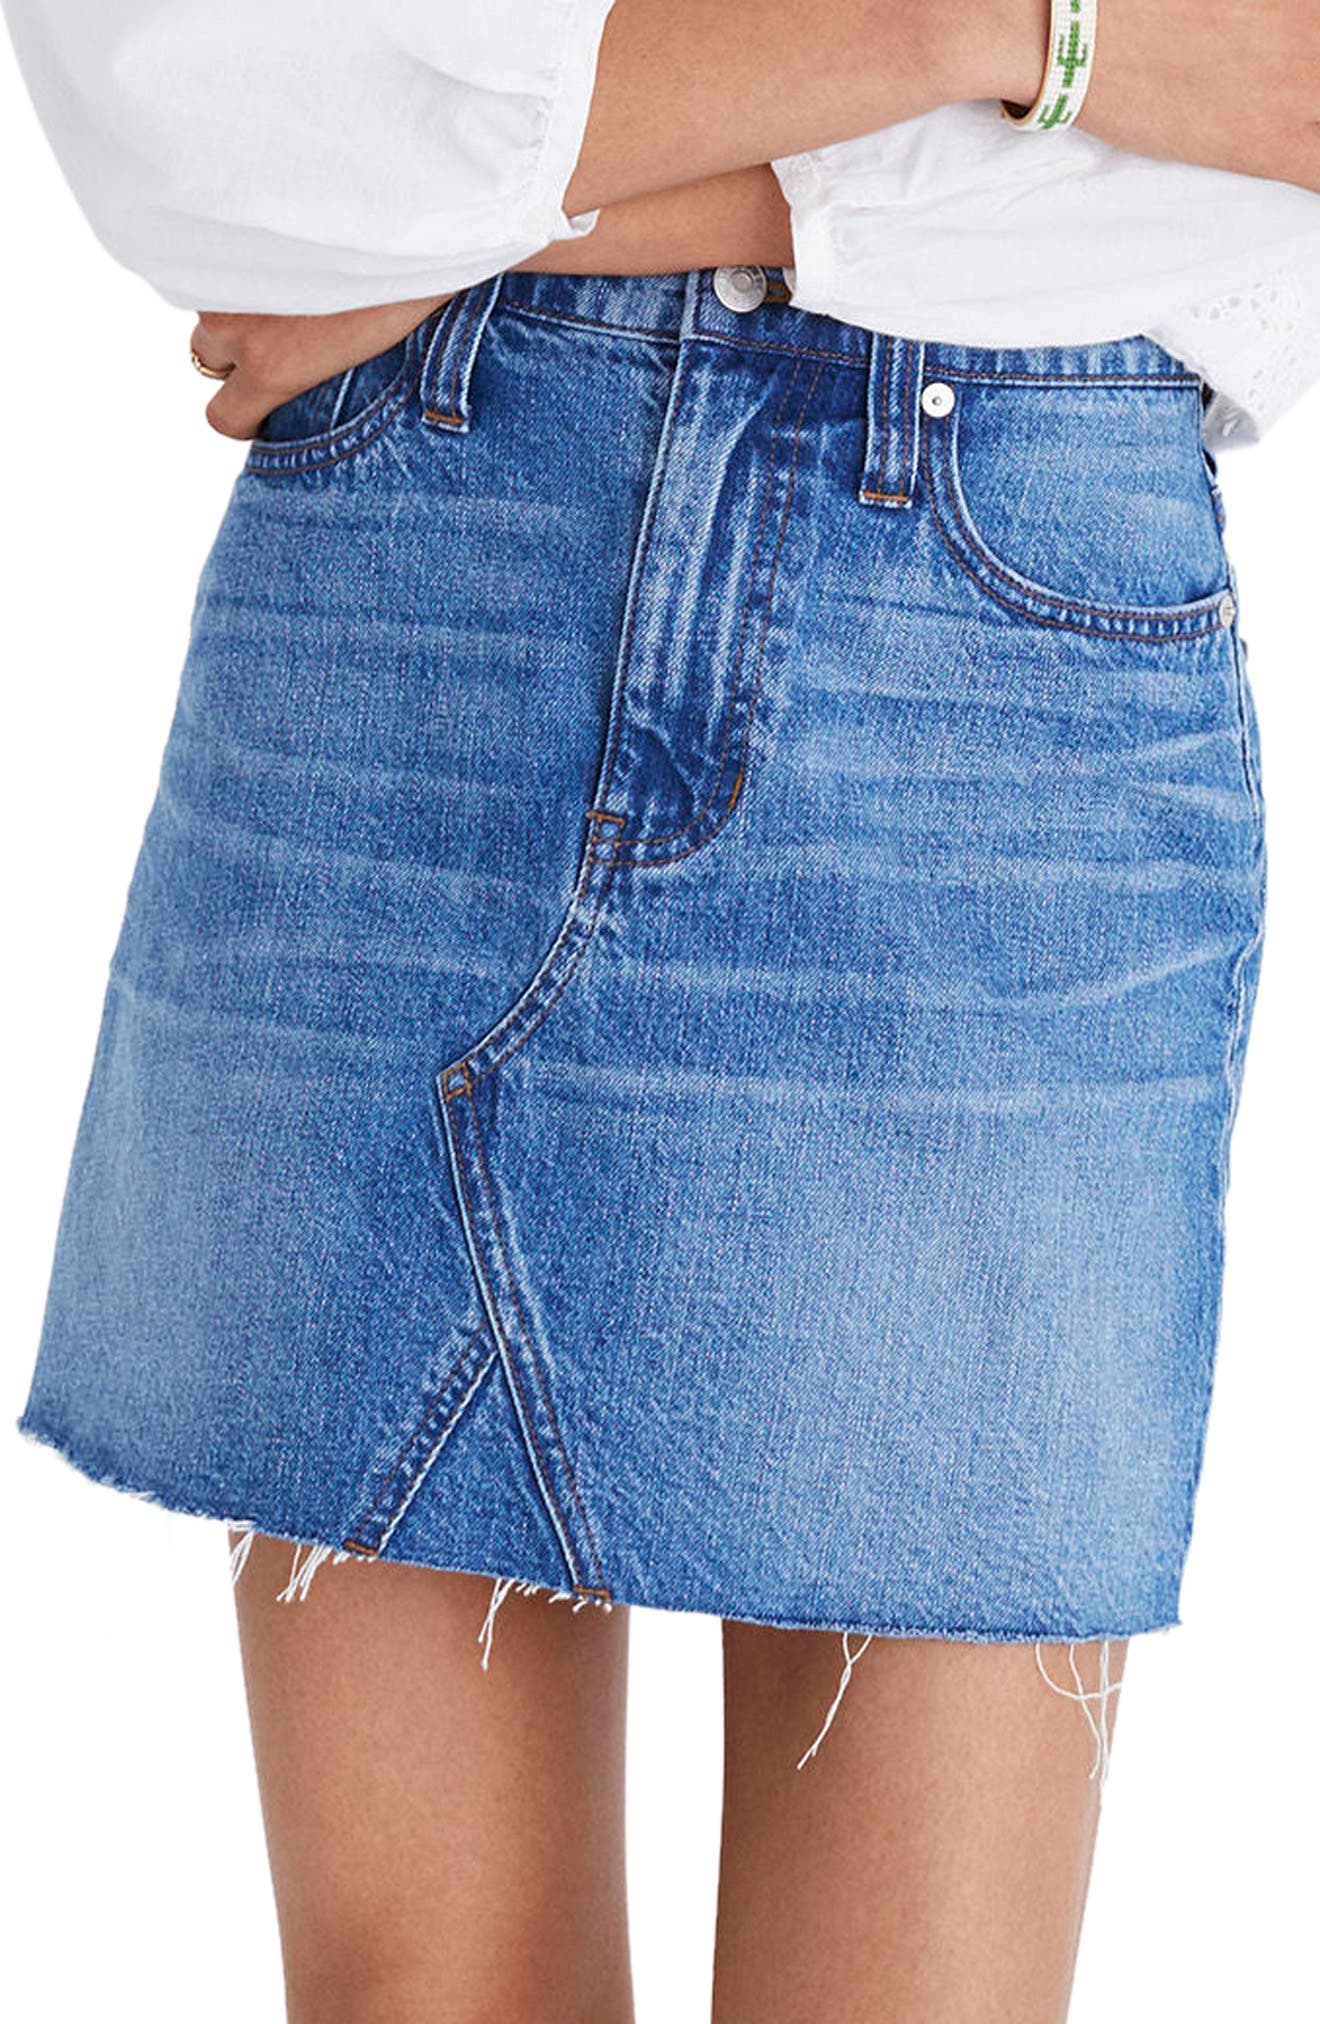 Frisco Denim Miniskirt,                             Main thumbnail 1, color,                             Leandra Wash